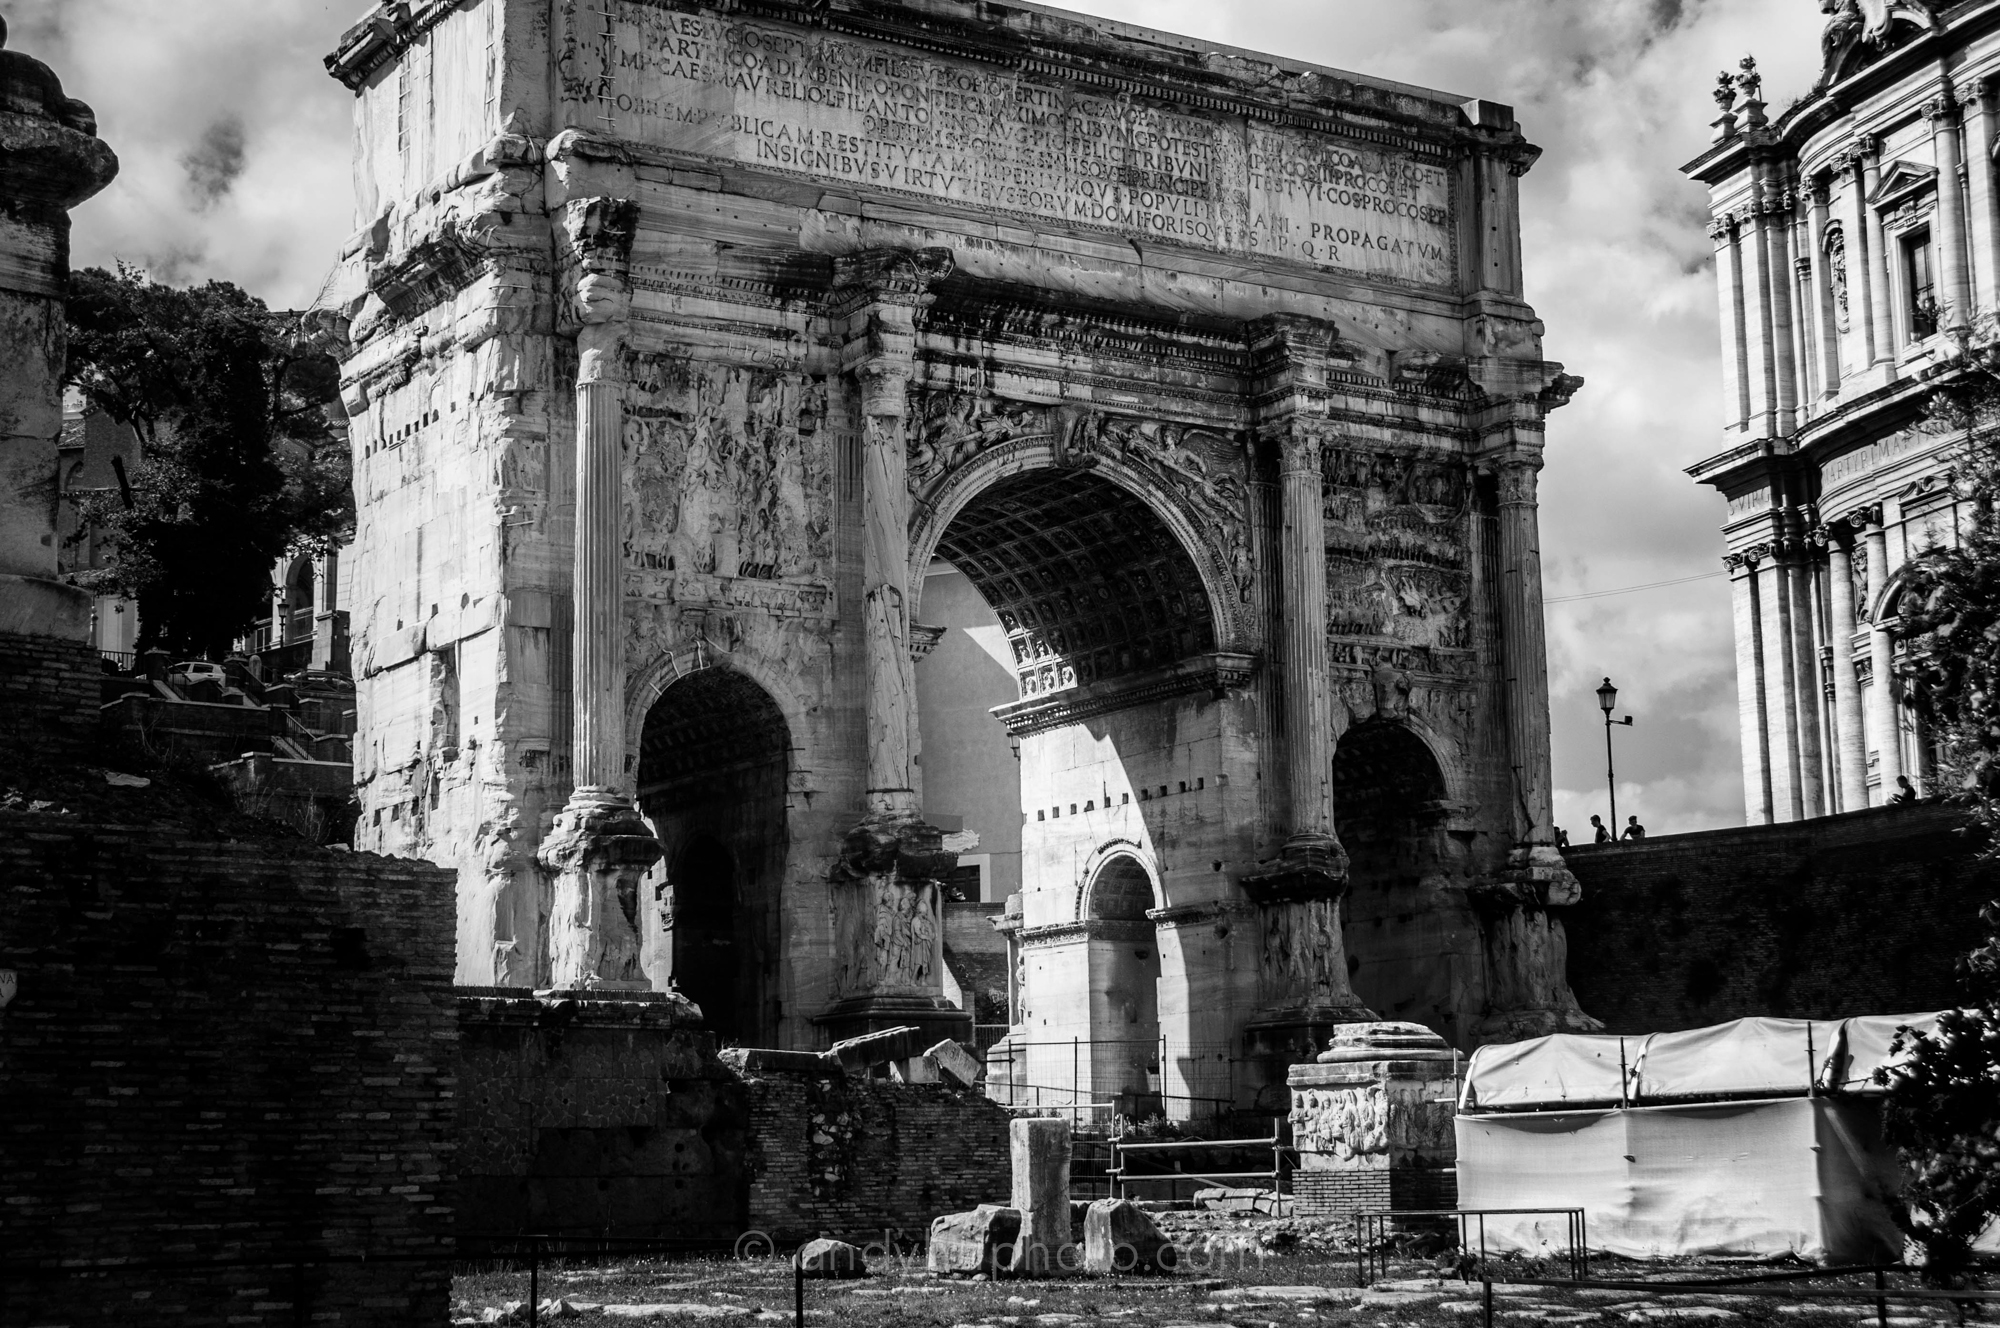 The Arch of Septimus Severus